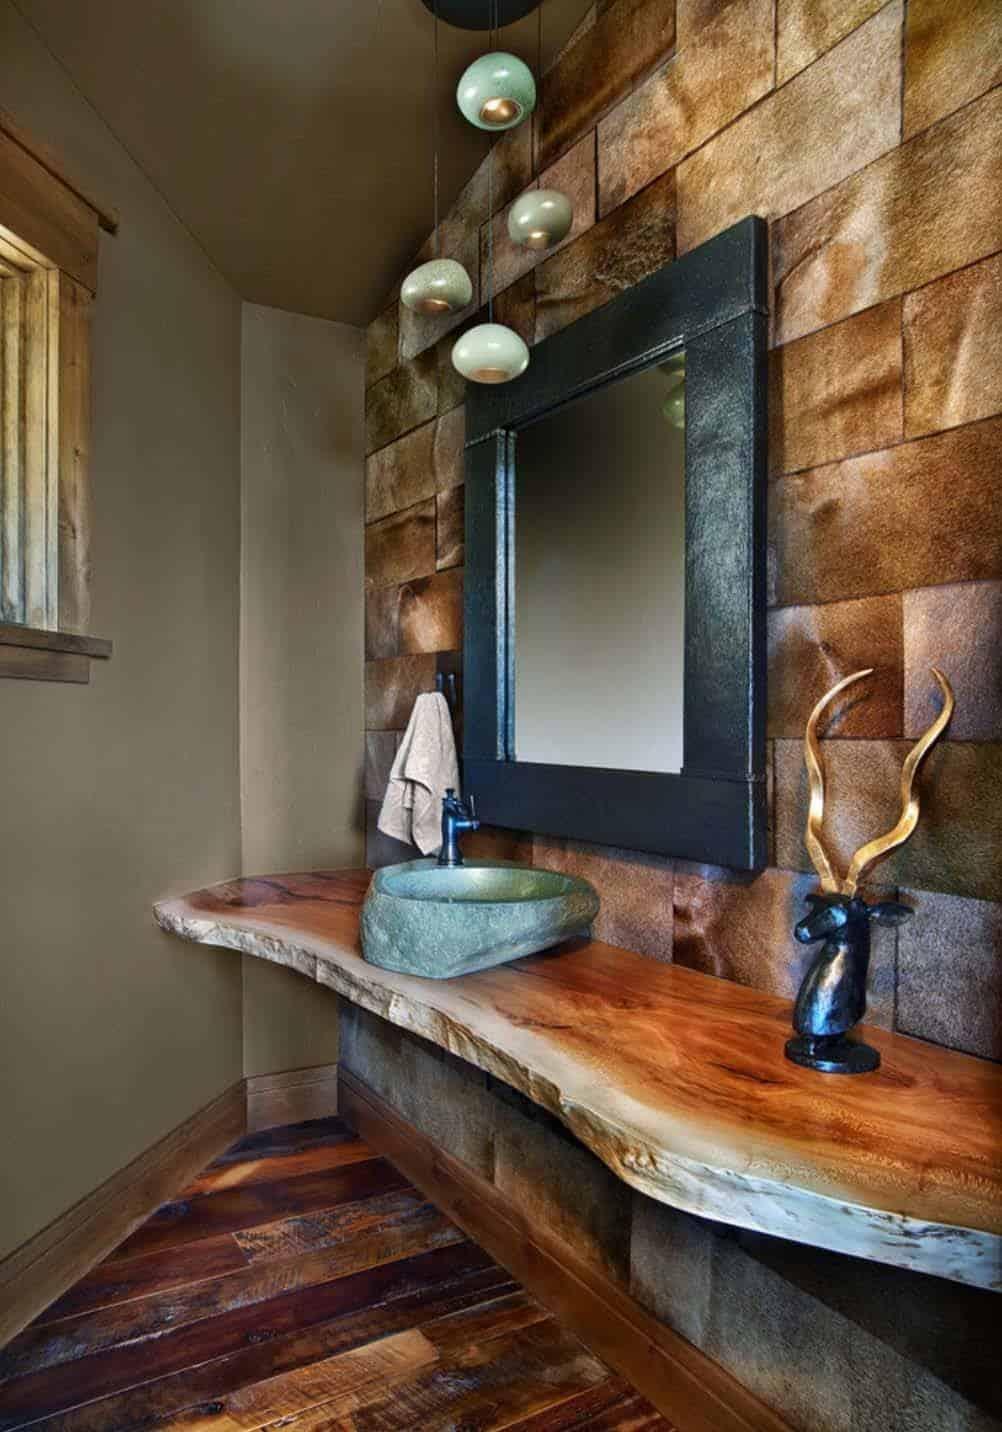 Modern Rustic Retreat-JJ Interiors-17-1 Kindesign